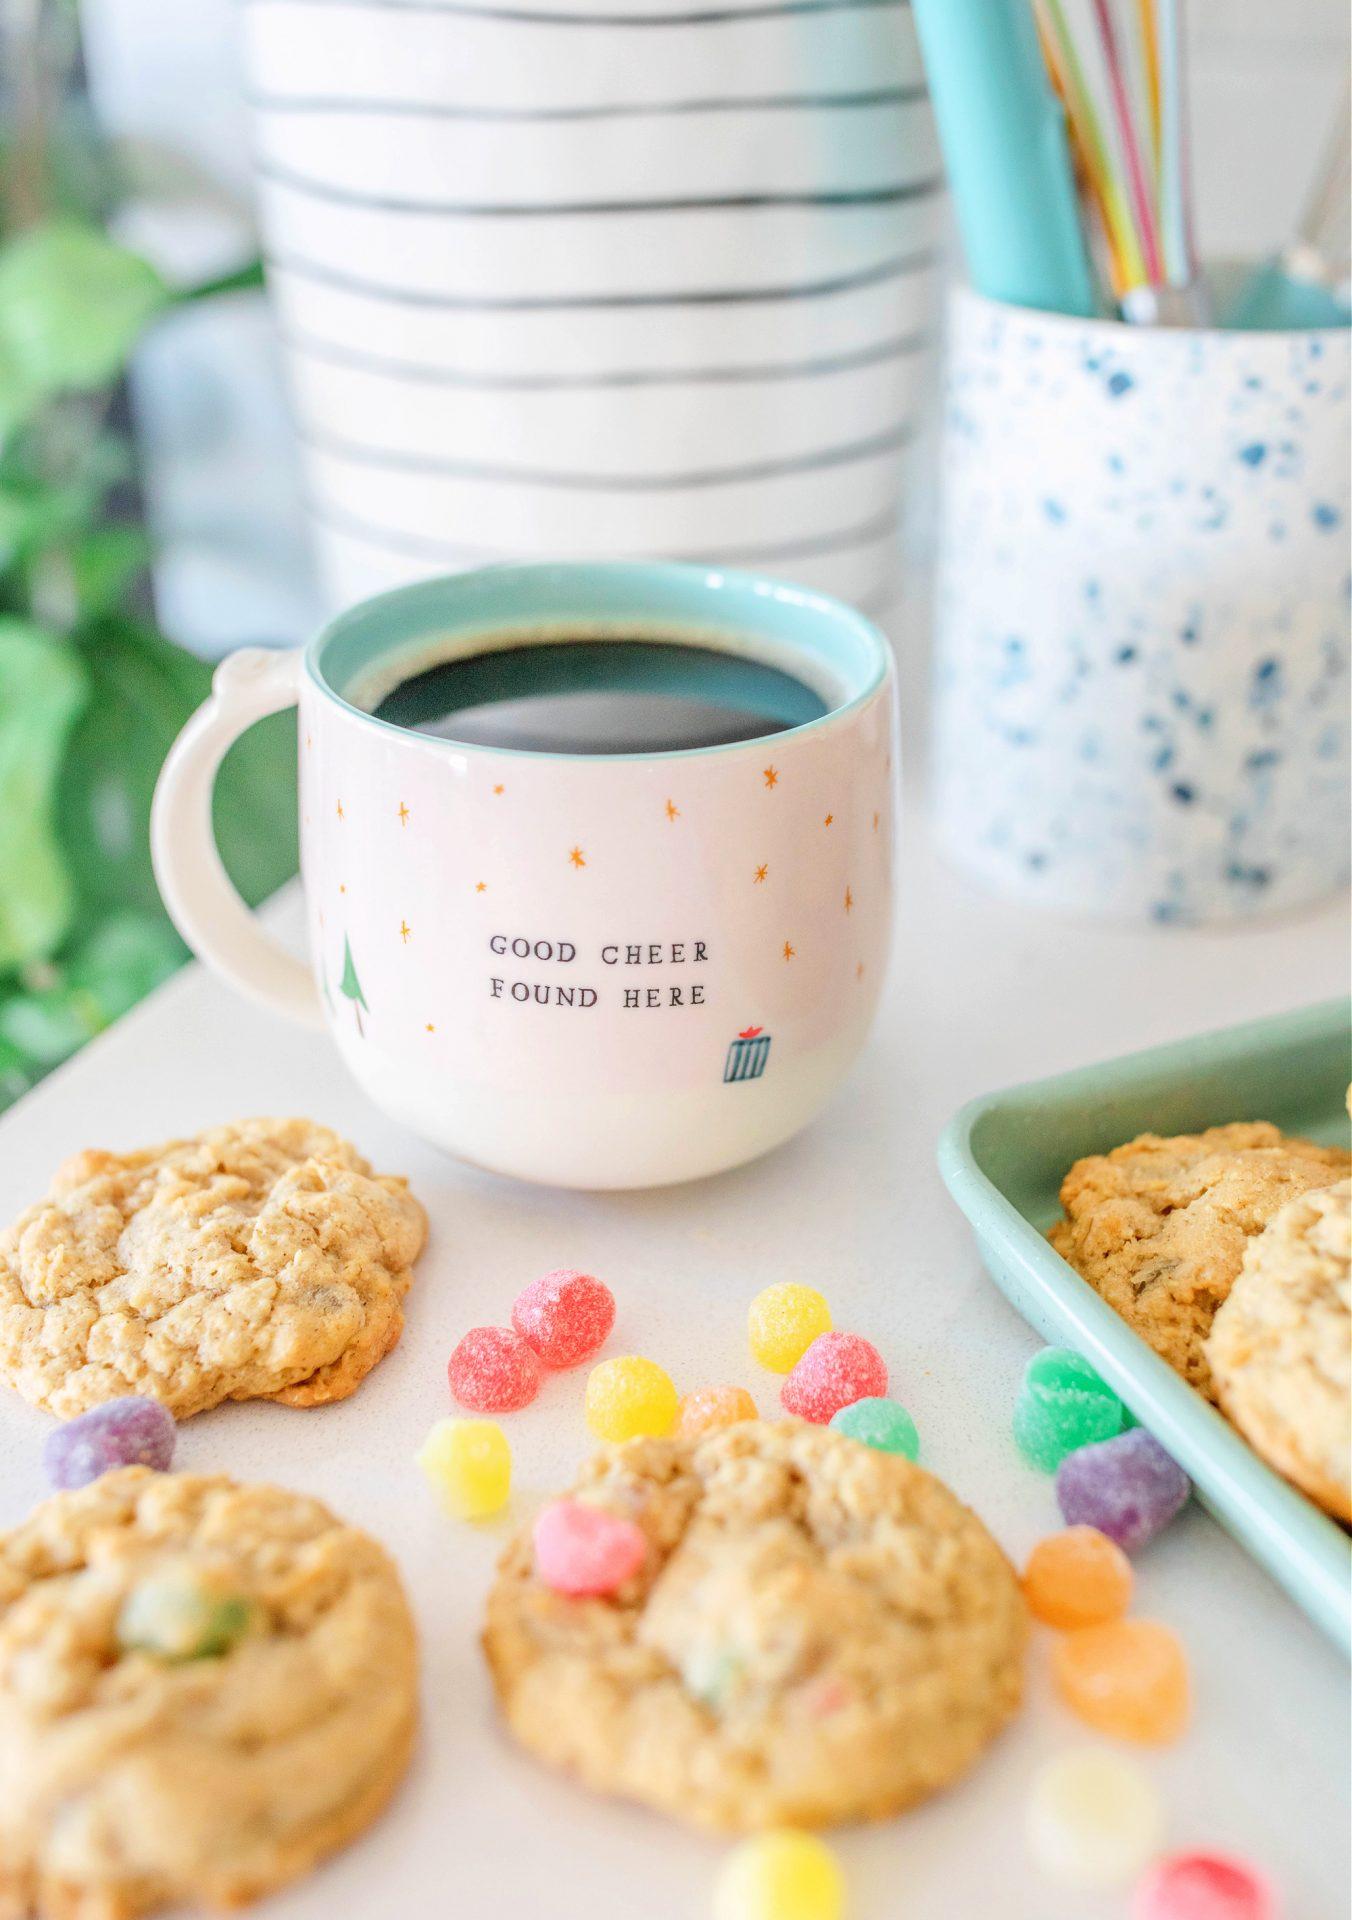 Grandpas gumdrop cookies, oatmeal cookies, spice drops, gumdrops, cookies, christmas cookies, delicious, baking, gluten-free,